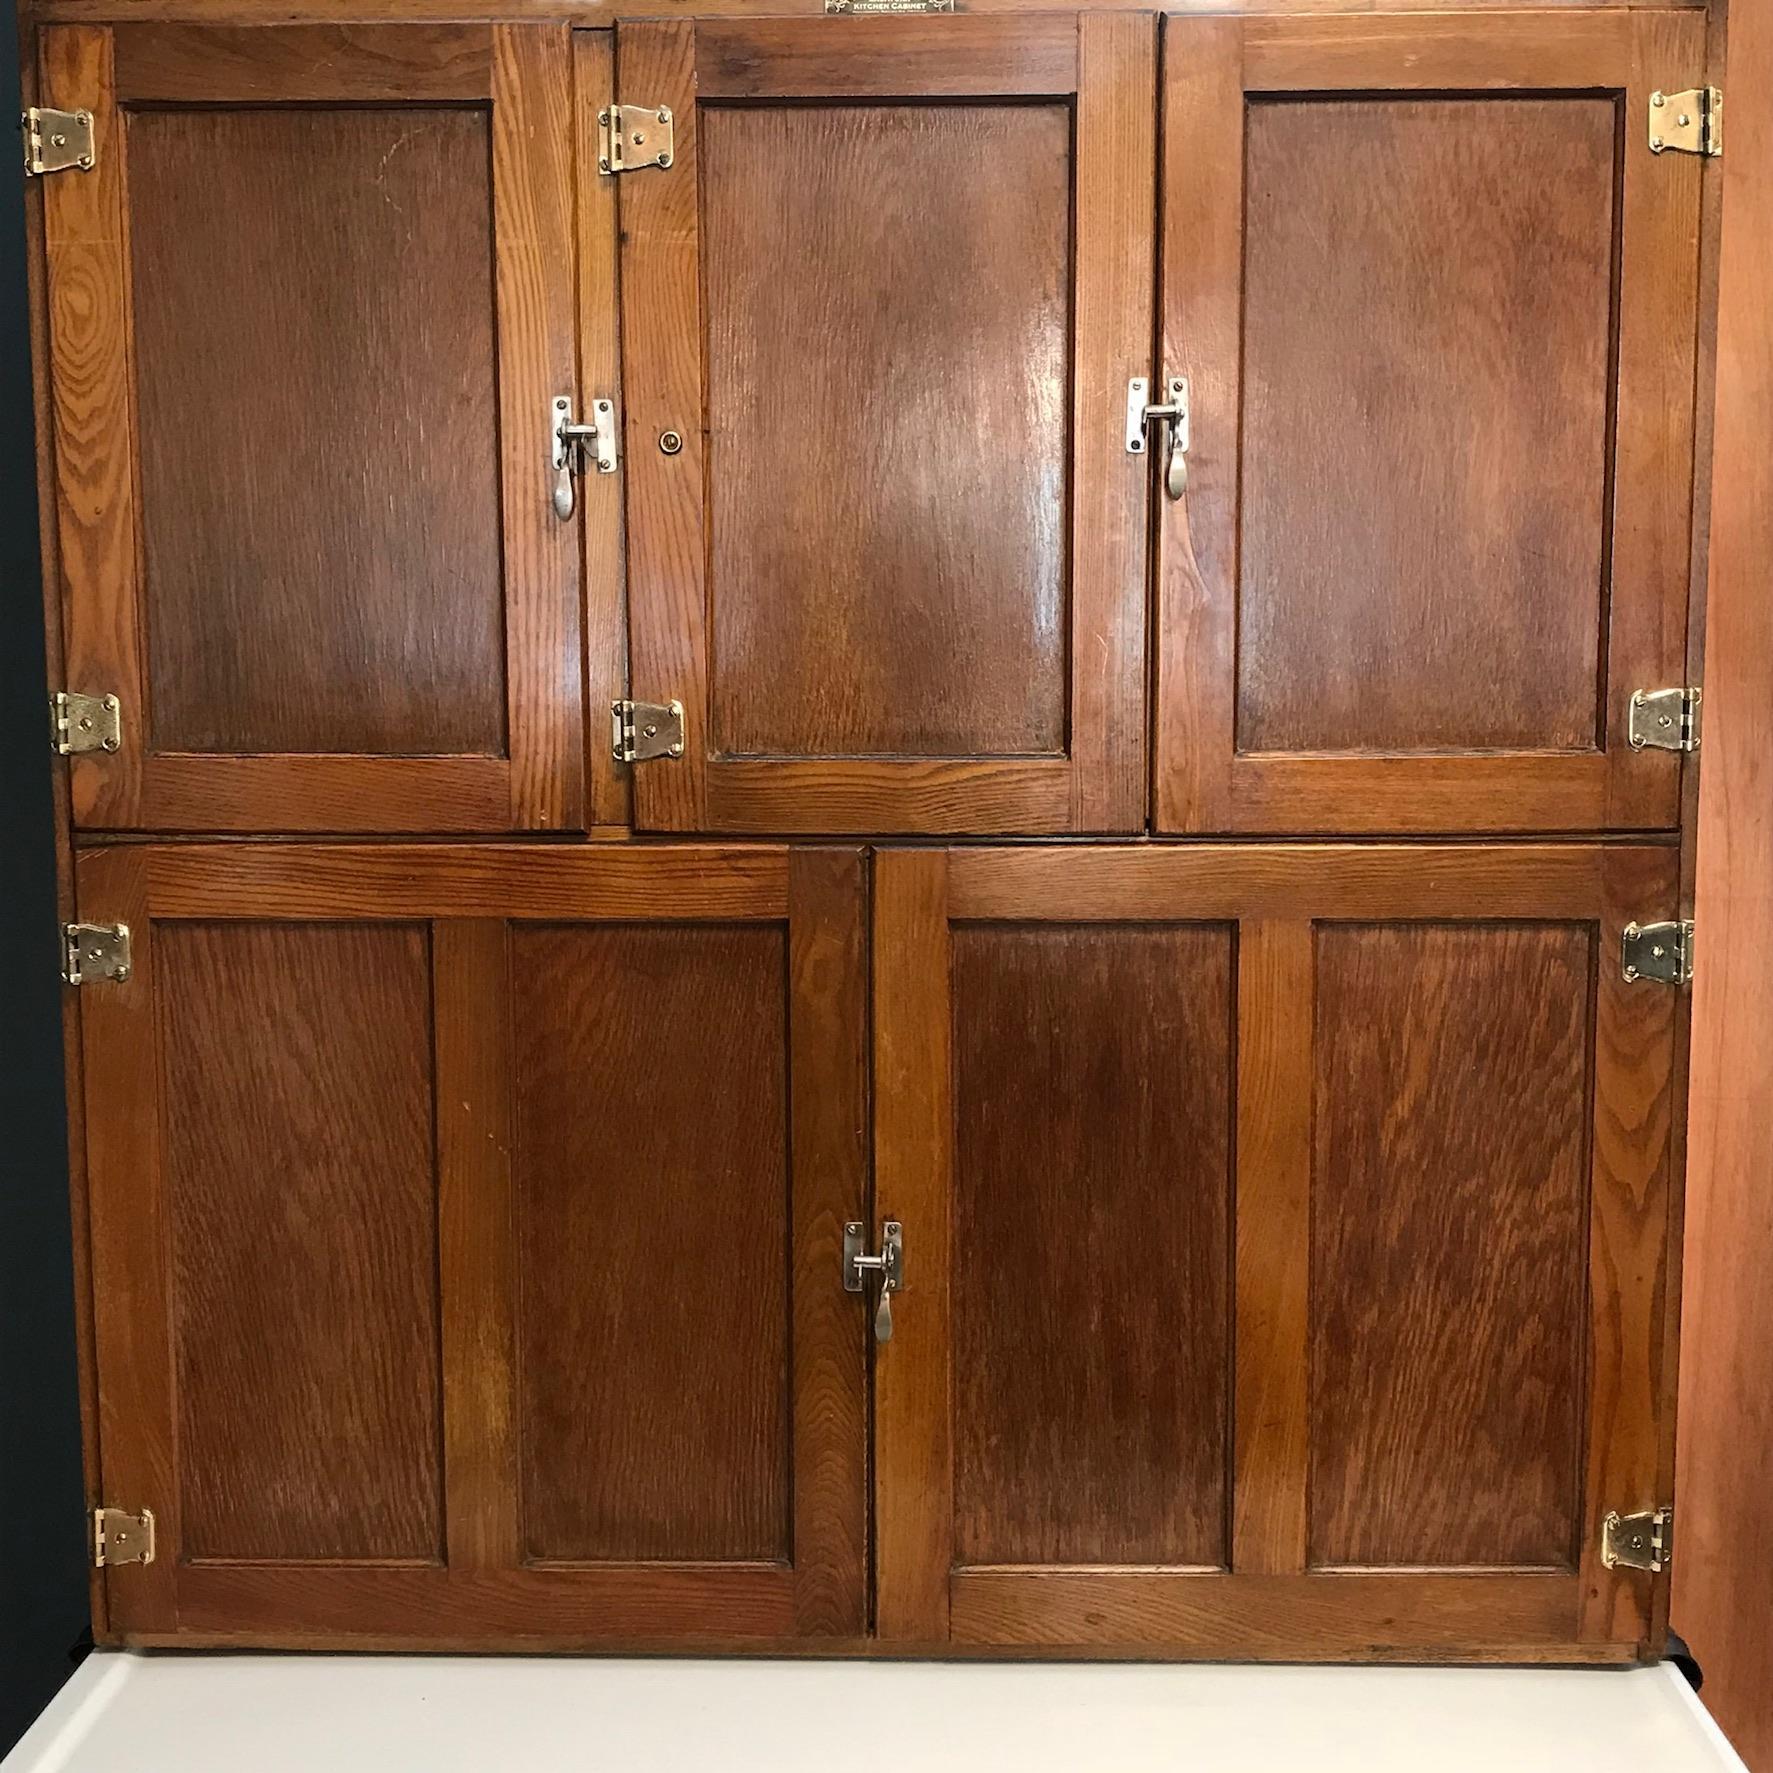 1920s Easiwork Oak Kitchen Cabinet - Furniture etc ...